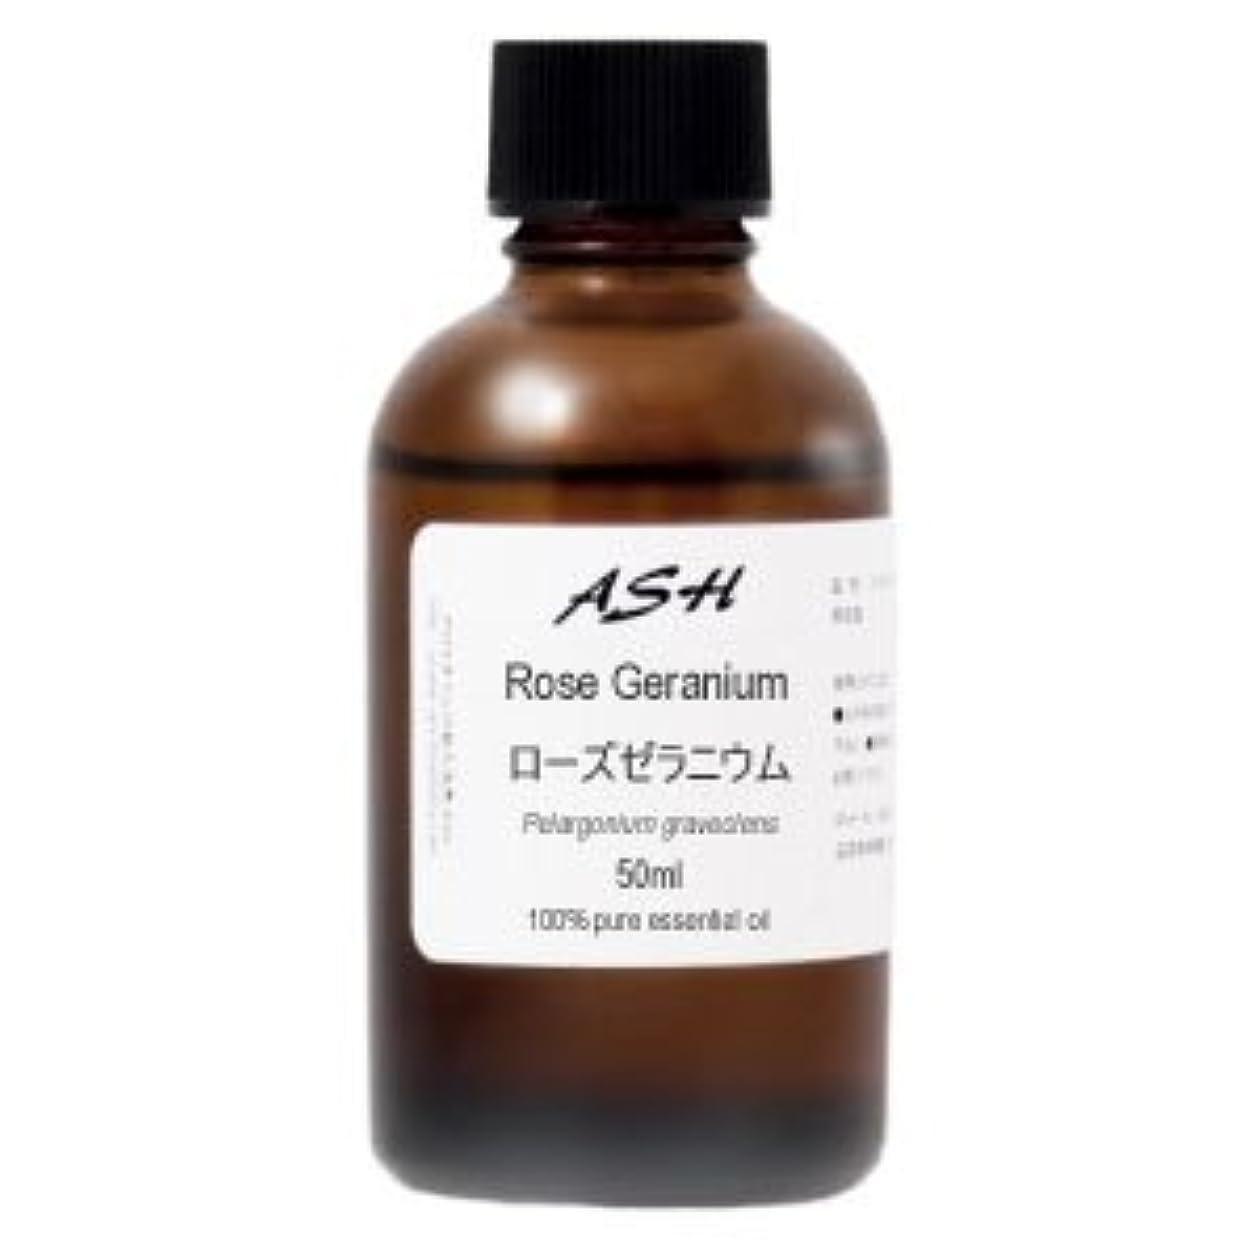 ASH ローズゼラニウム エッセンシャルオイル 50ml AEAJ表示基準適合認定精油